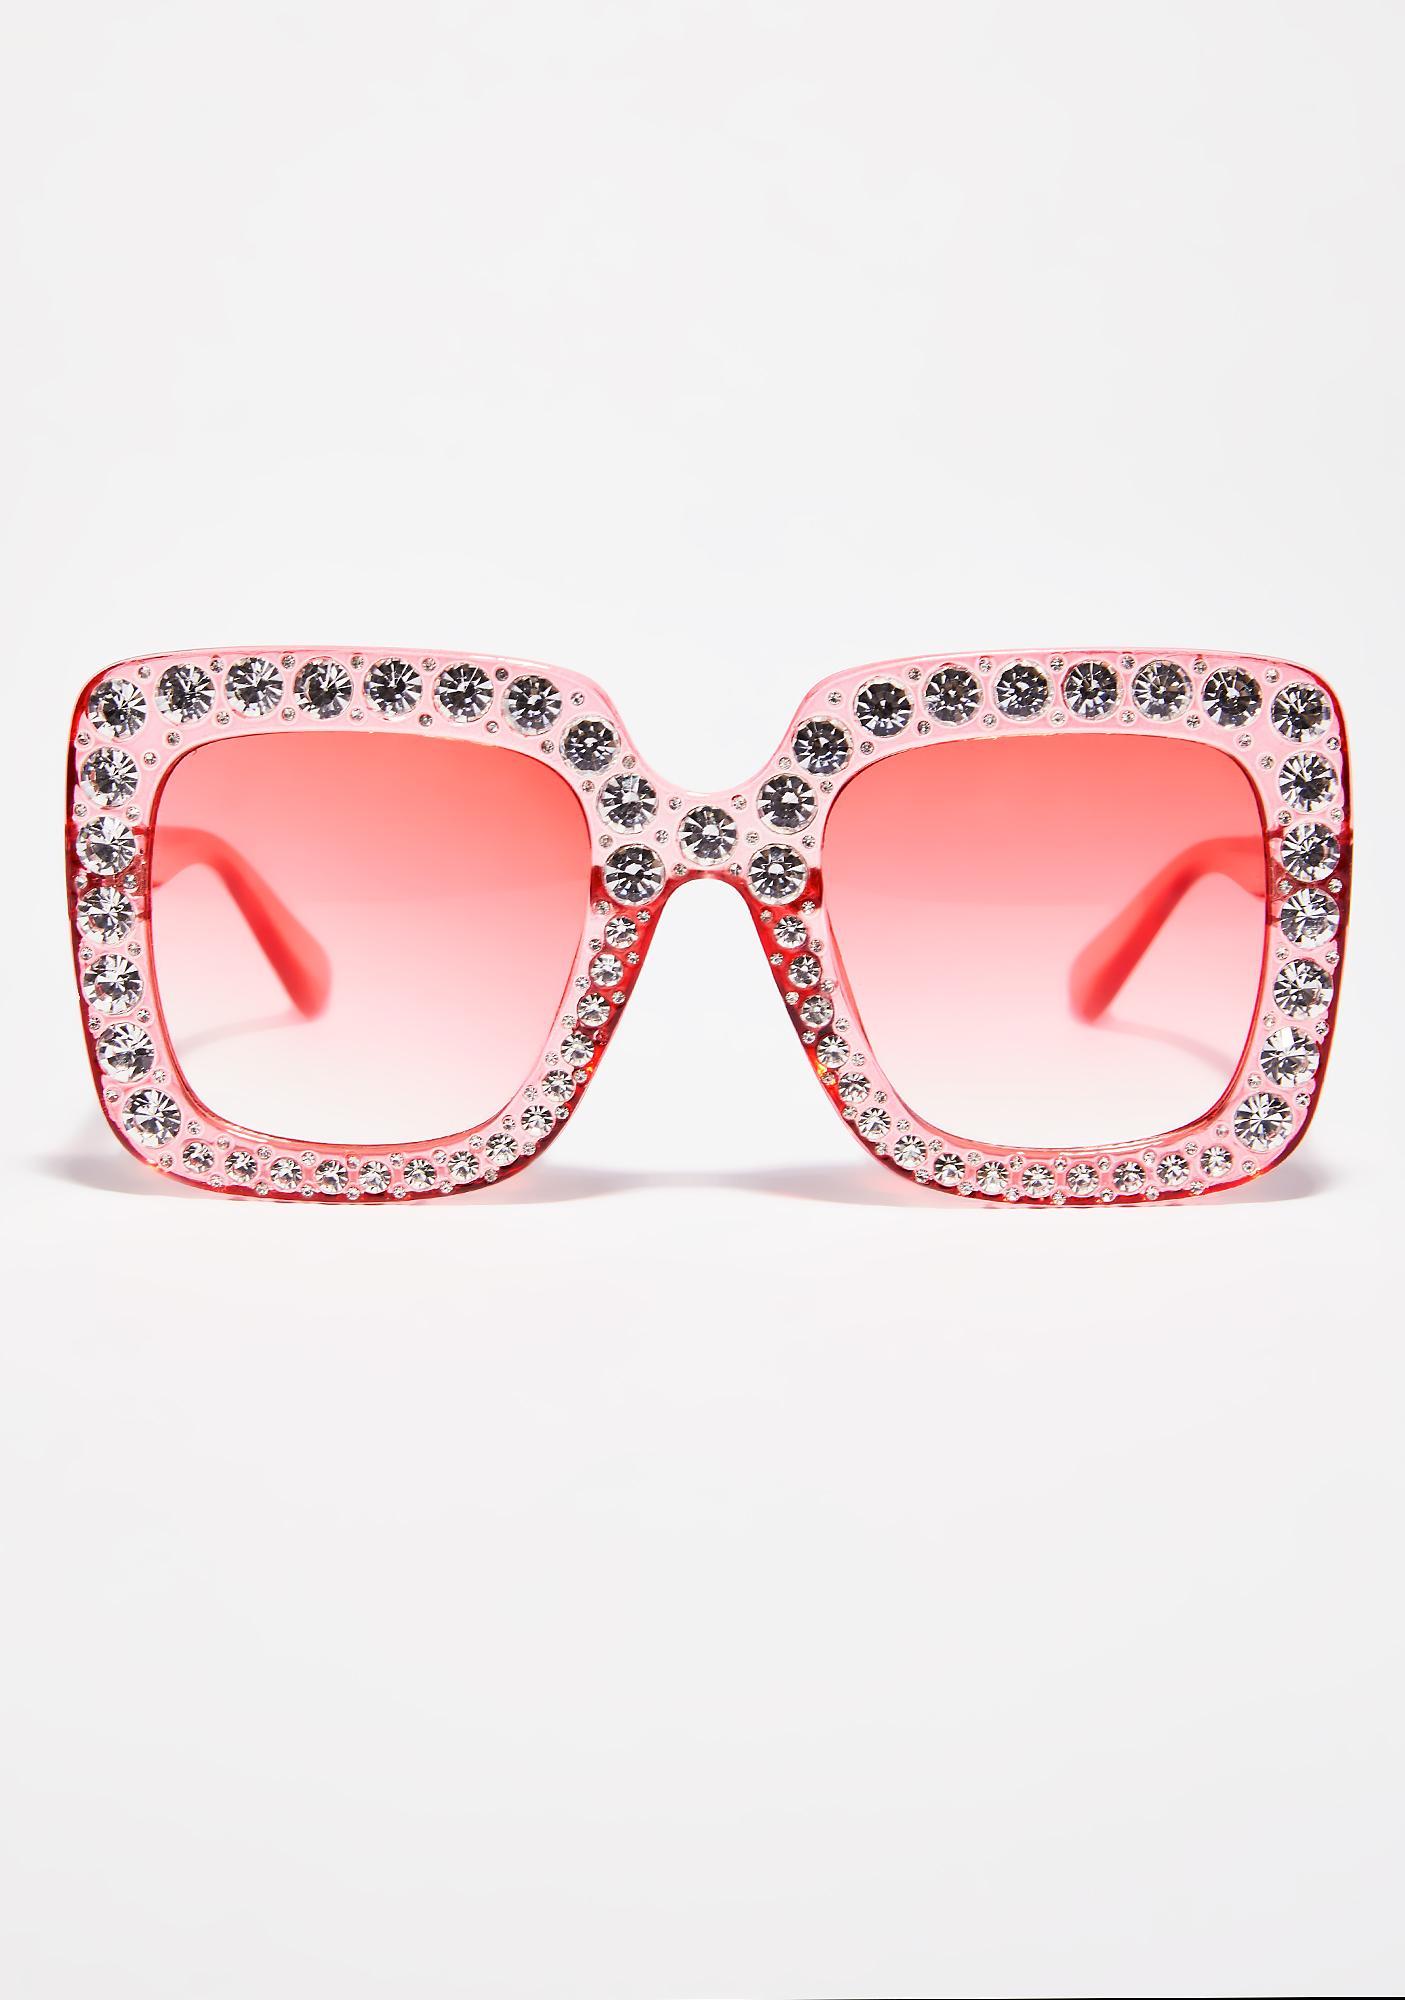 Feelin' Flossy Sunglasses